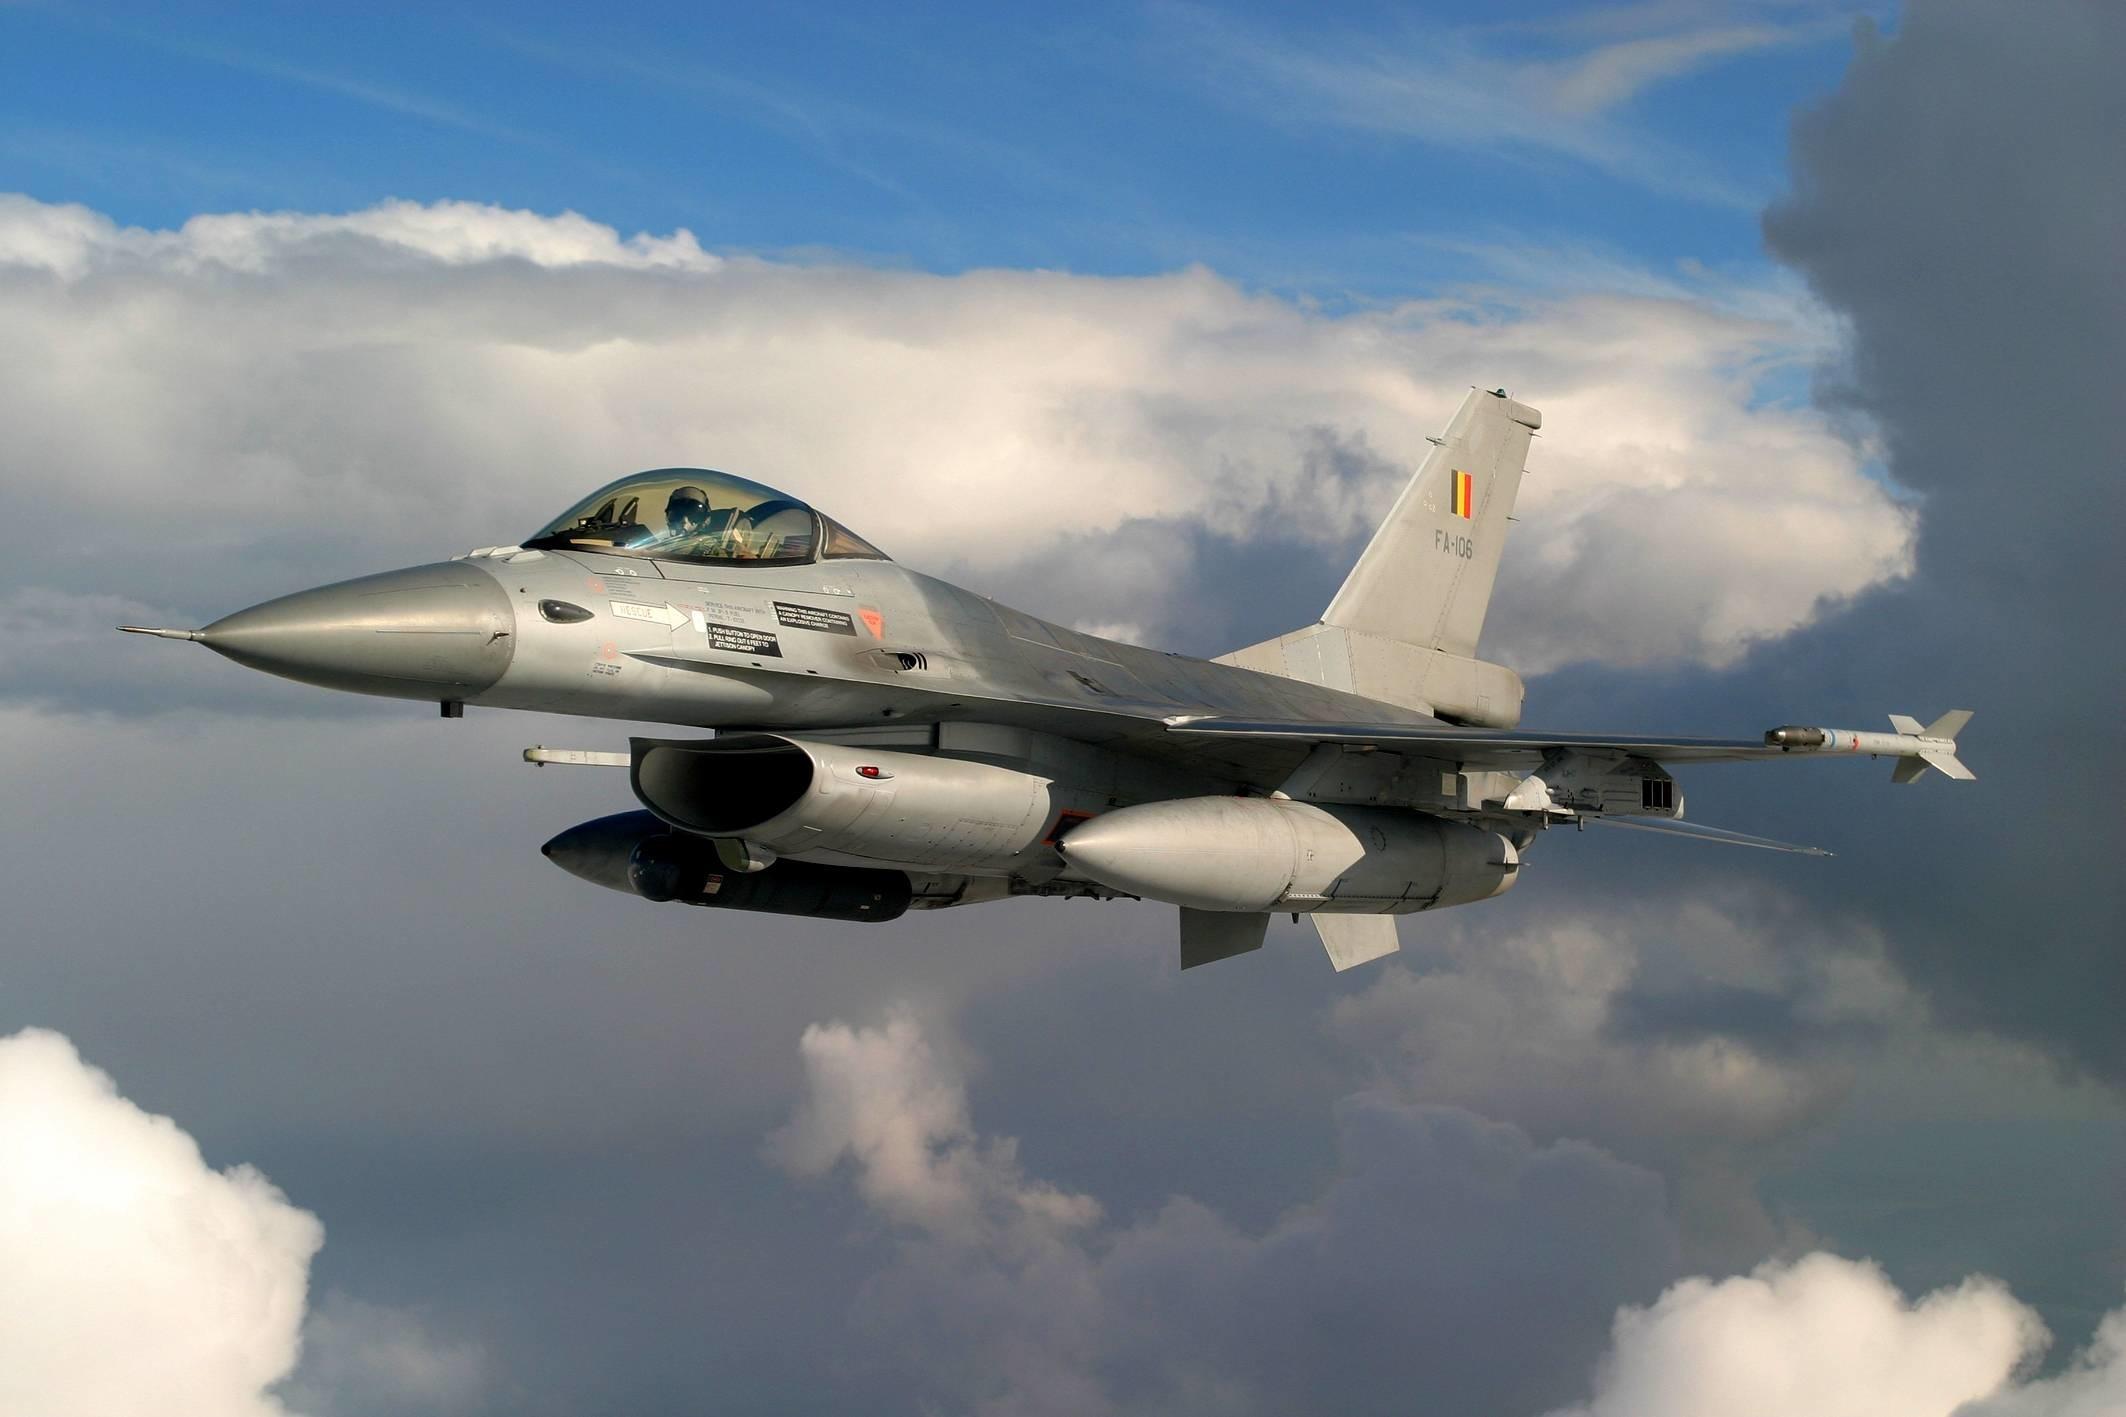 HD F16 Fighting Falcon Wallpaper | Download Free – 126571